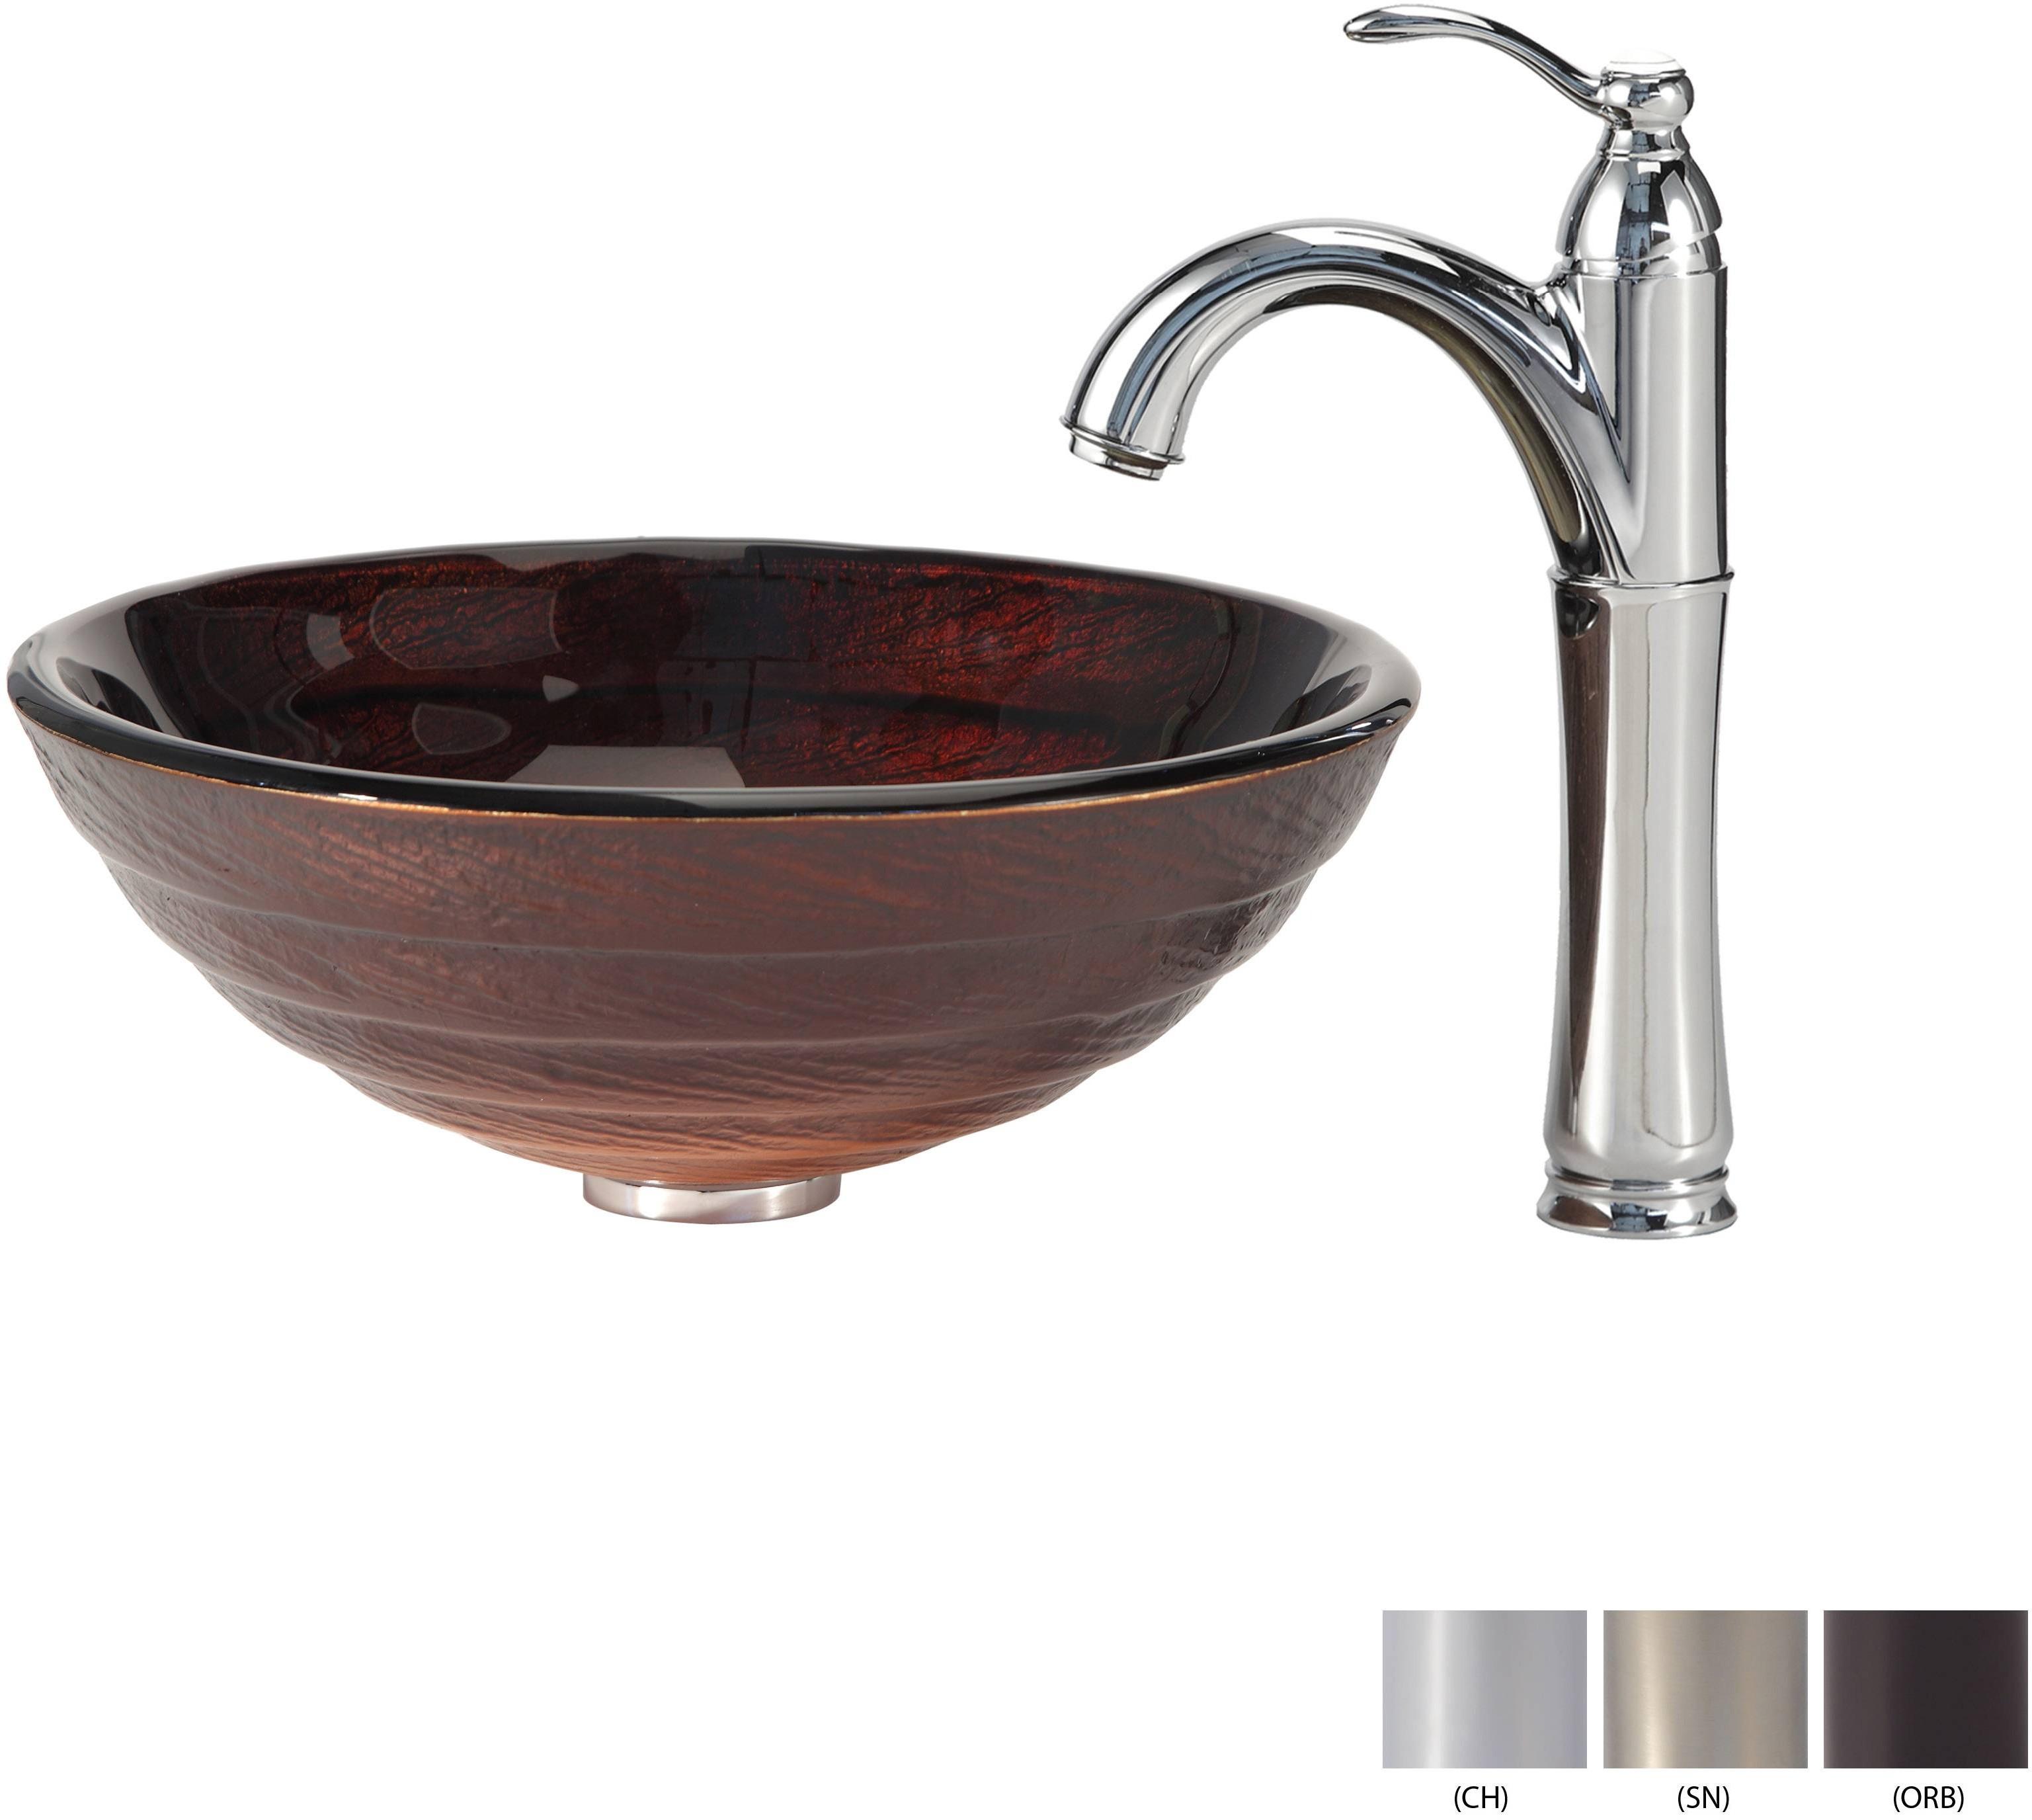 Kraus C-GV-693-19mm-1005SN Iris Glass Vessel Sink and Riviera Faucet Satin Nickel